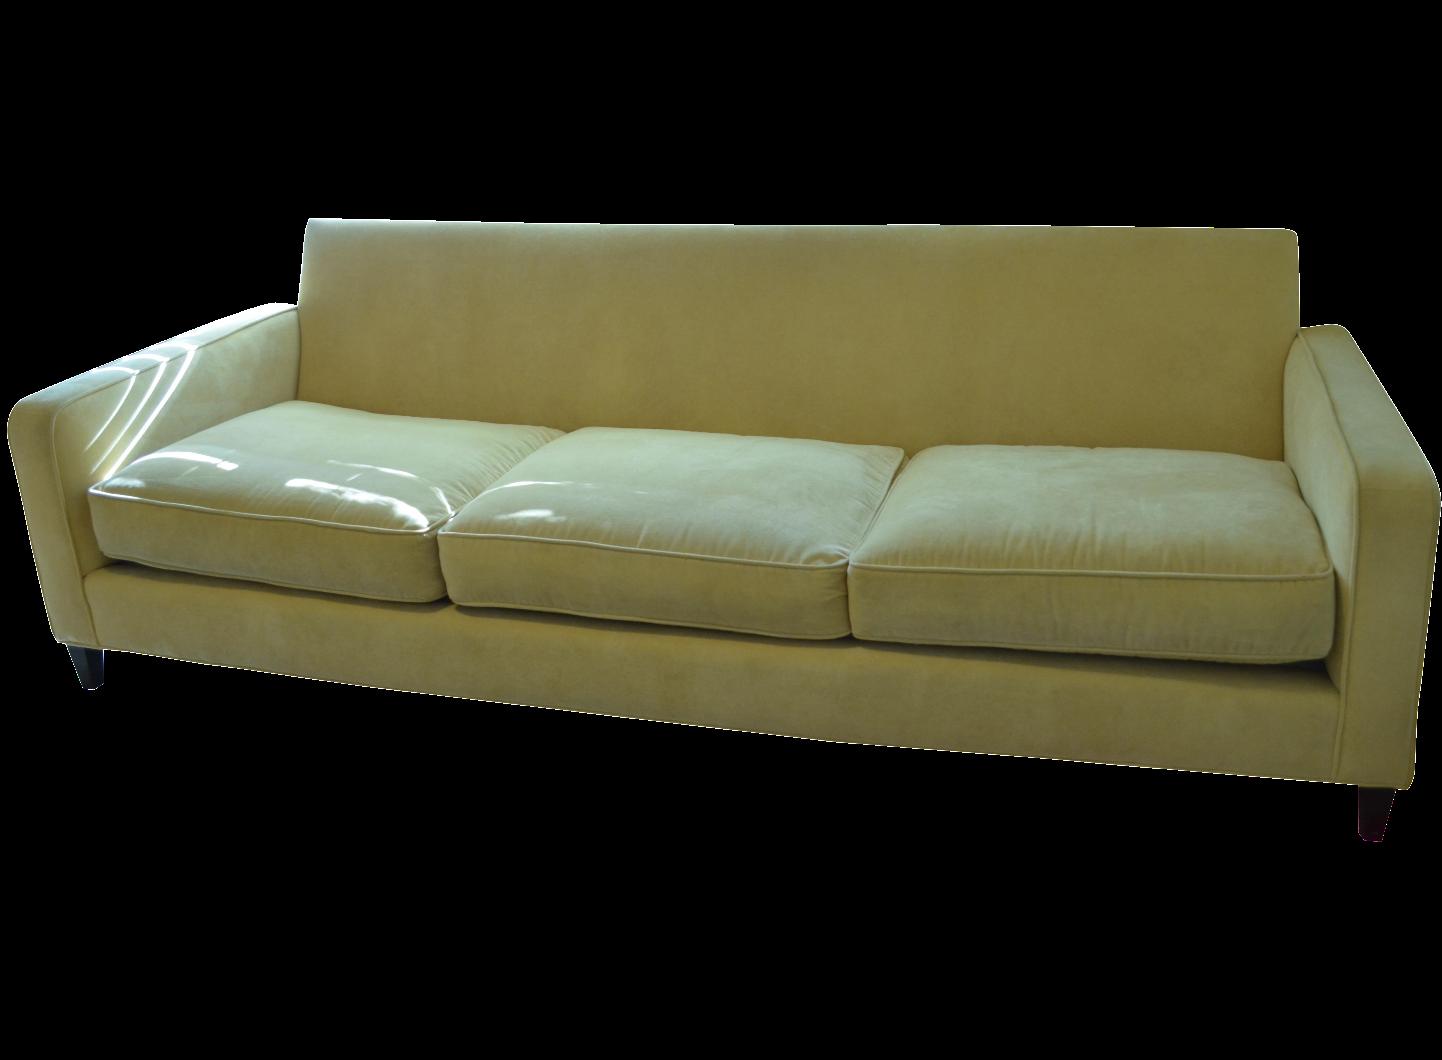 ballard designs queens velvet yellow vintage sofa chairish ballard designs dakota sofa slipcover and frame polyvore